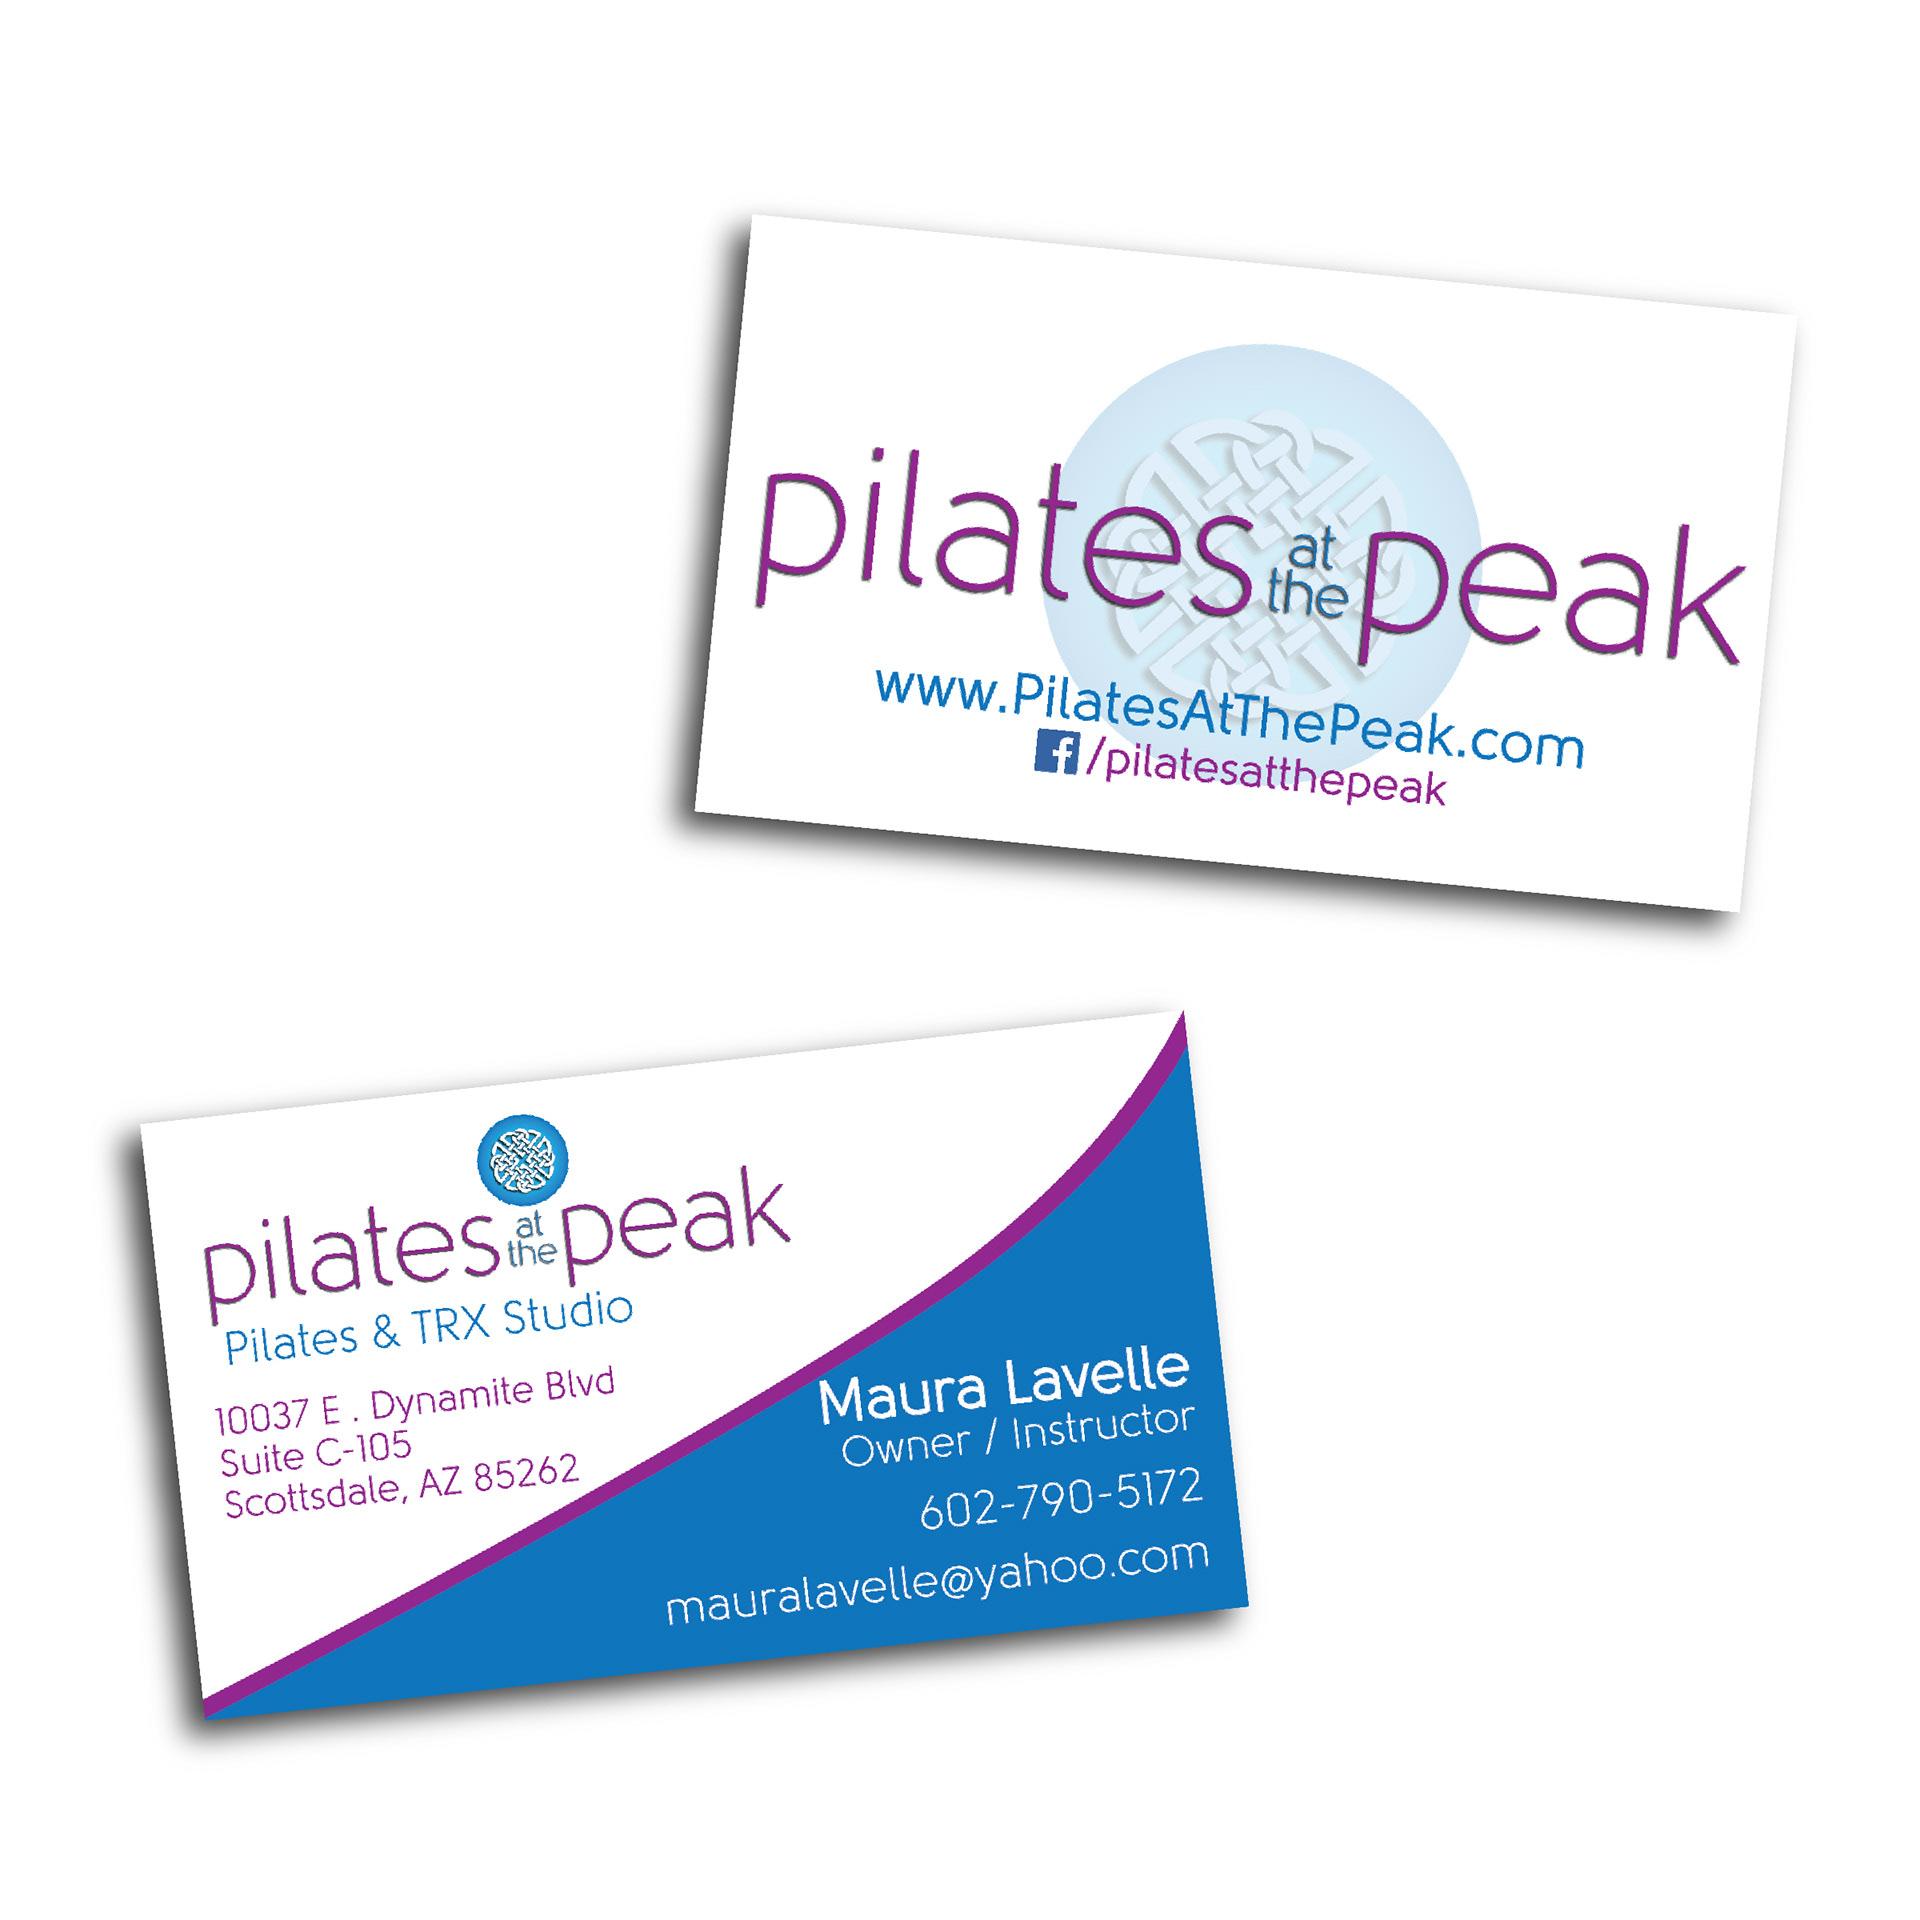 Ginomai creative design portfolio pilates at the peak scottsdale az business card design colourmoves